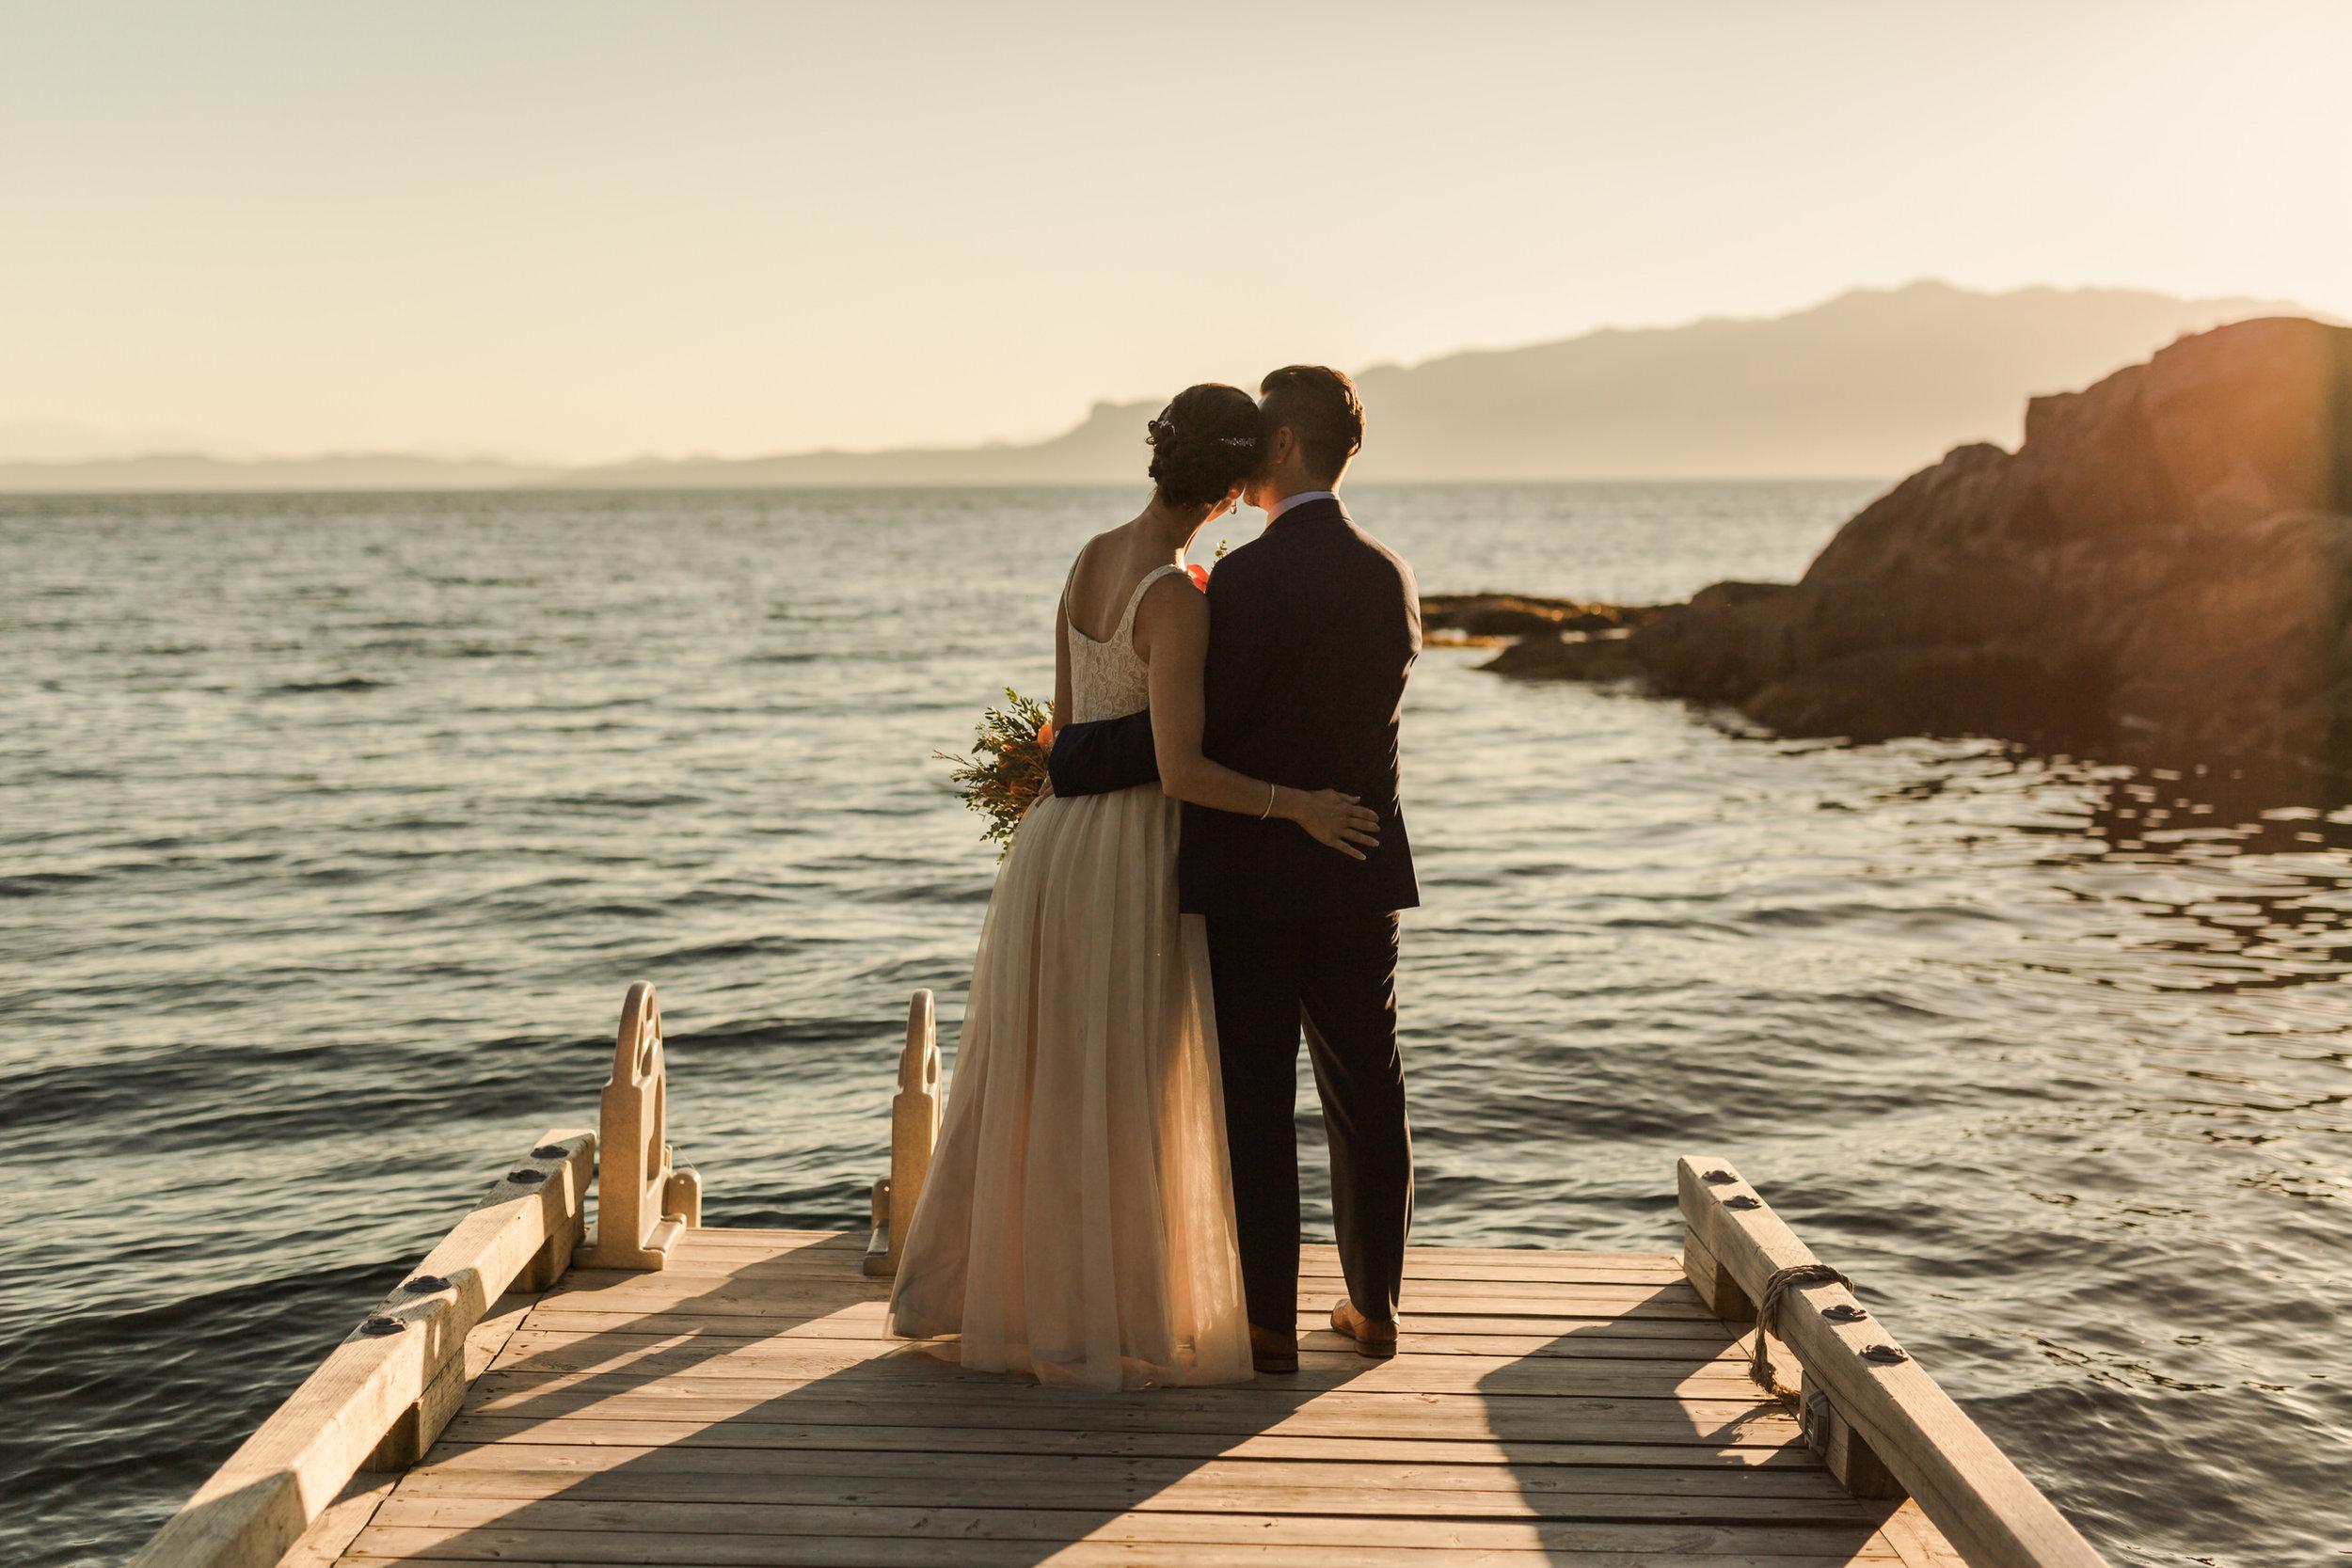 Rockwater Secret Cove Resort Wedding - Sunshine Coast BC Wedding Photographer - Vancouver Wedding Photographer - Sunshine Coast Elopement Photos - IMG_1180.jpg